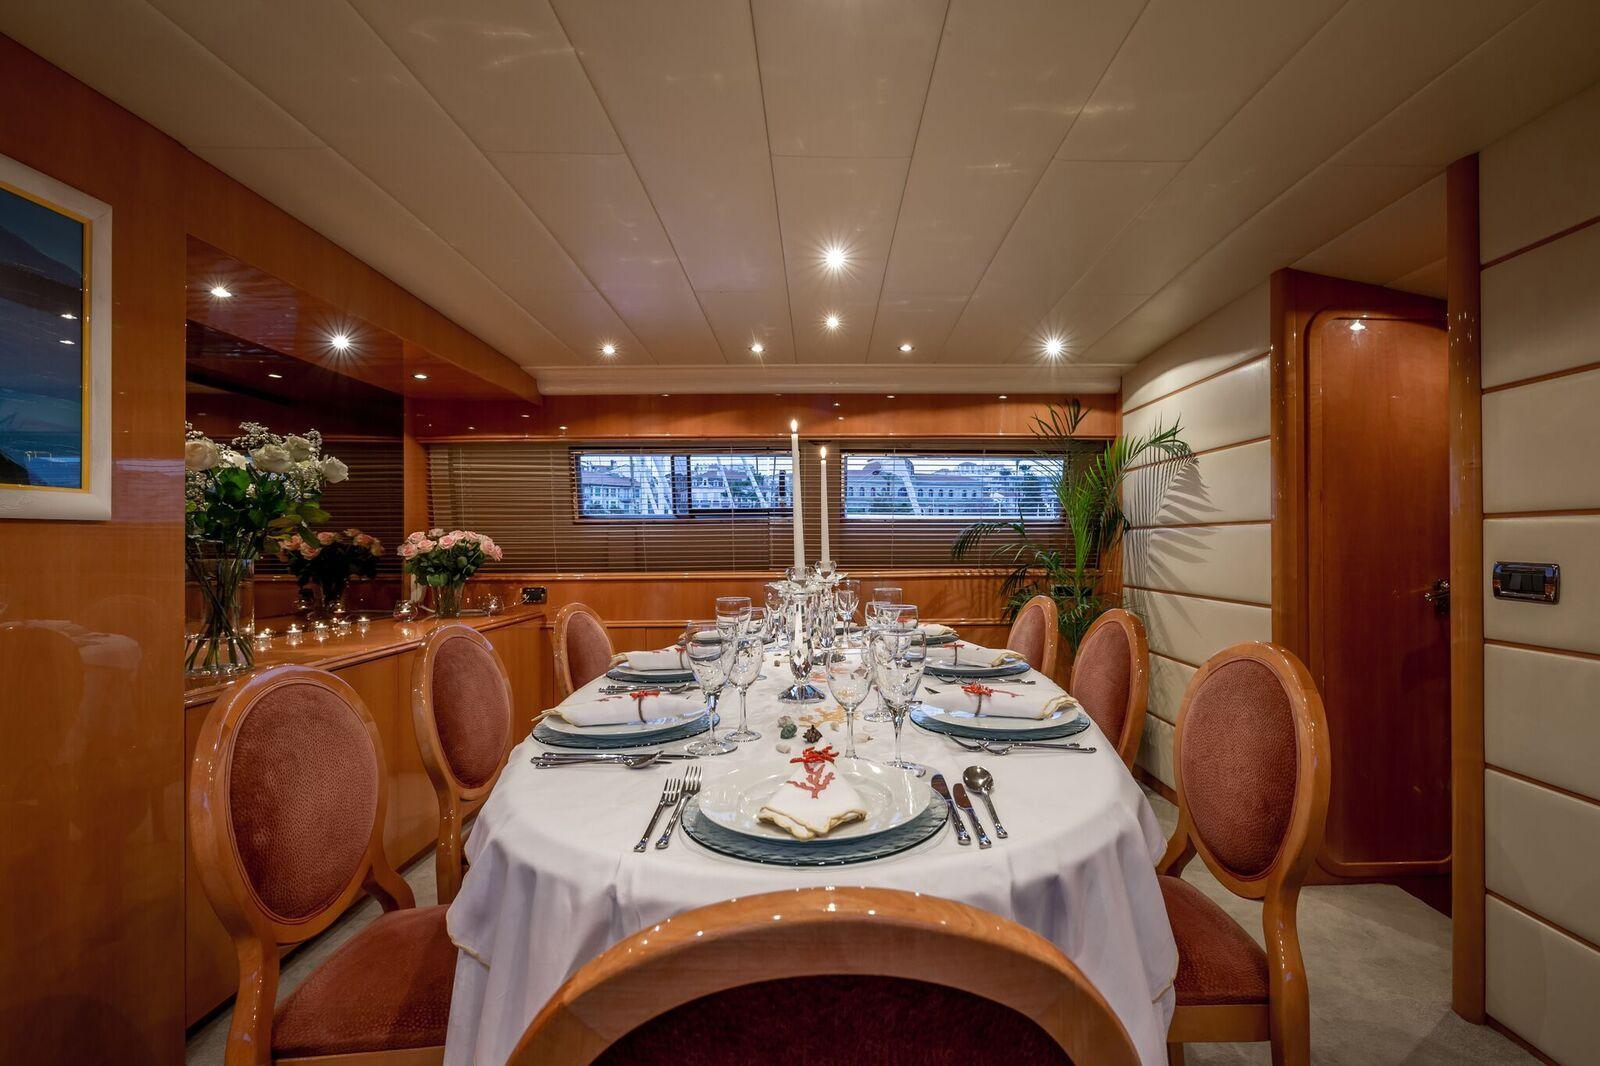 INDULGENCE OF POOLE Mangusta 86 Luxury Superyacht Dining Table